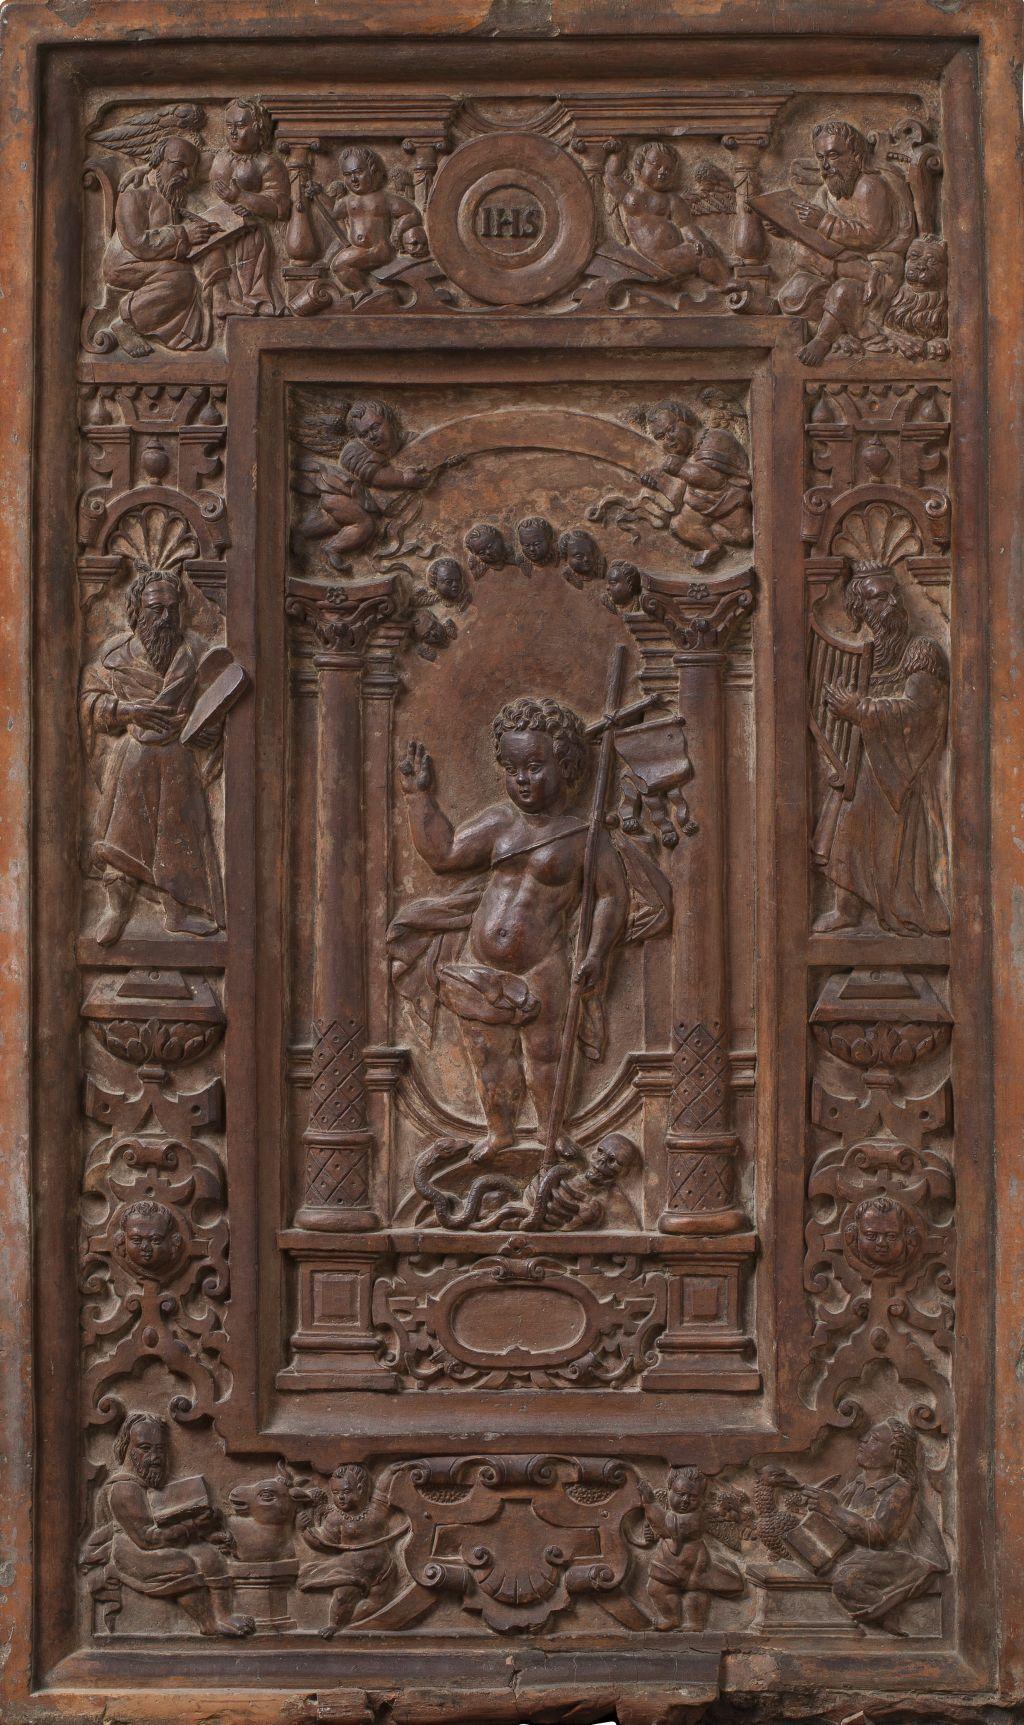 Placa: el Nen Jesús, Amberes